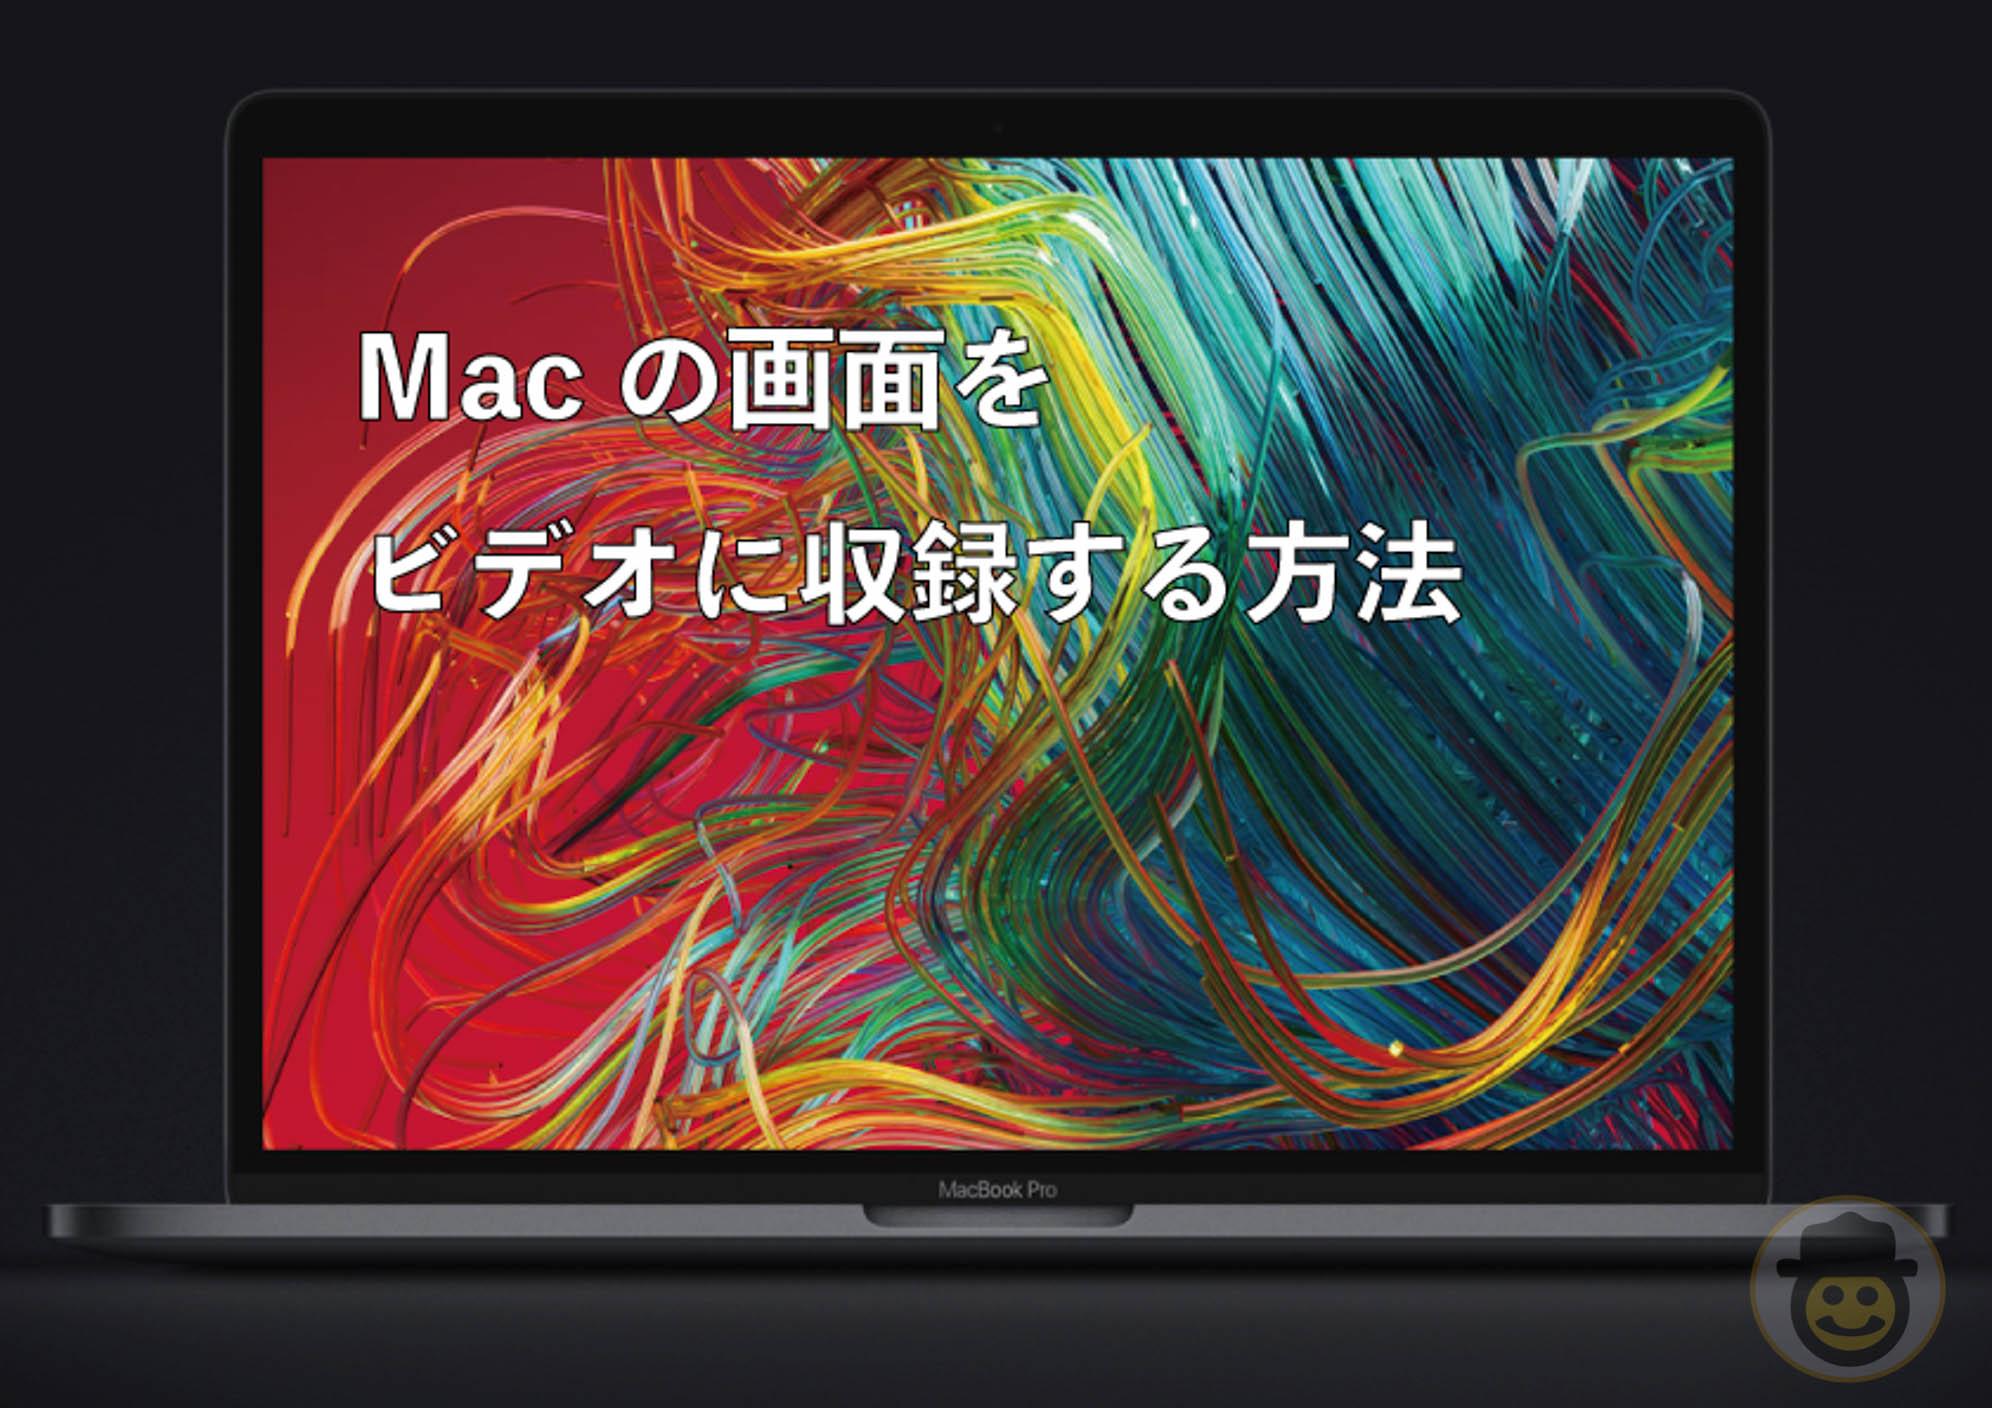 [ macOs Mojave 画面収録 ] Macの画面をビデオに録画する方法